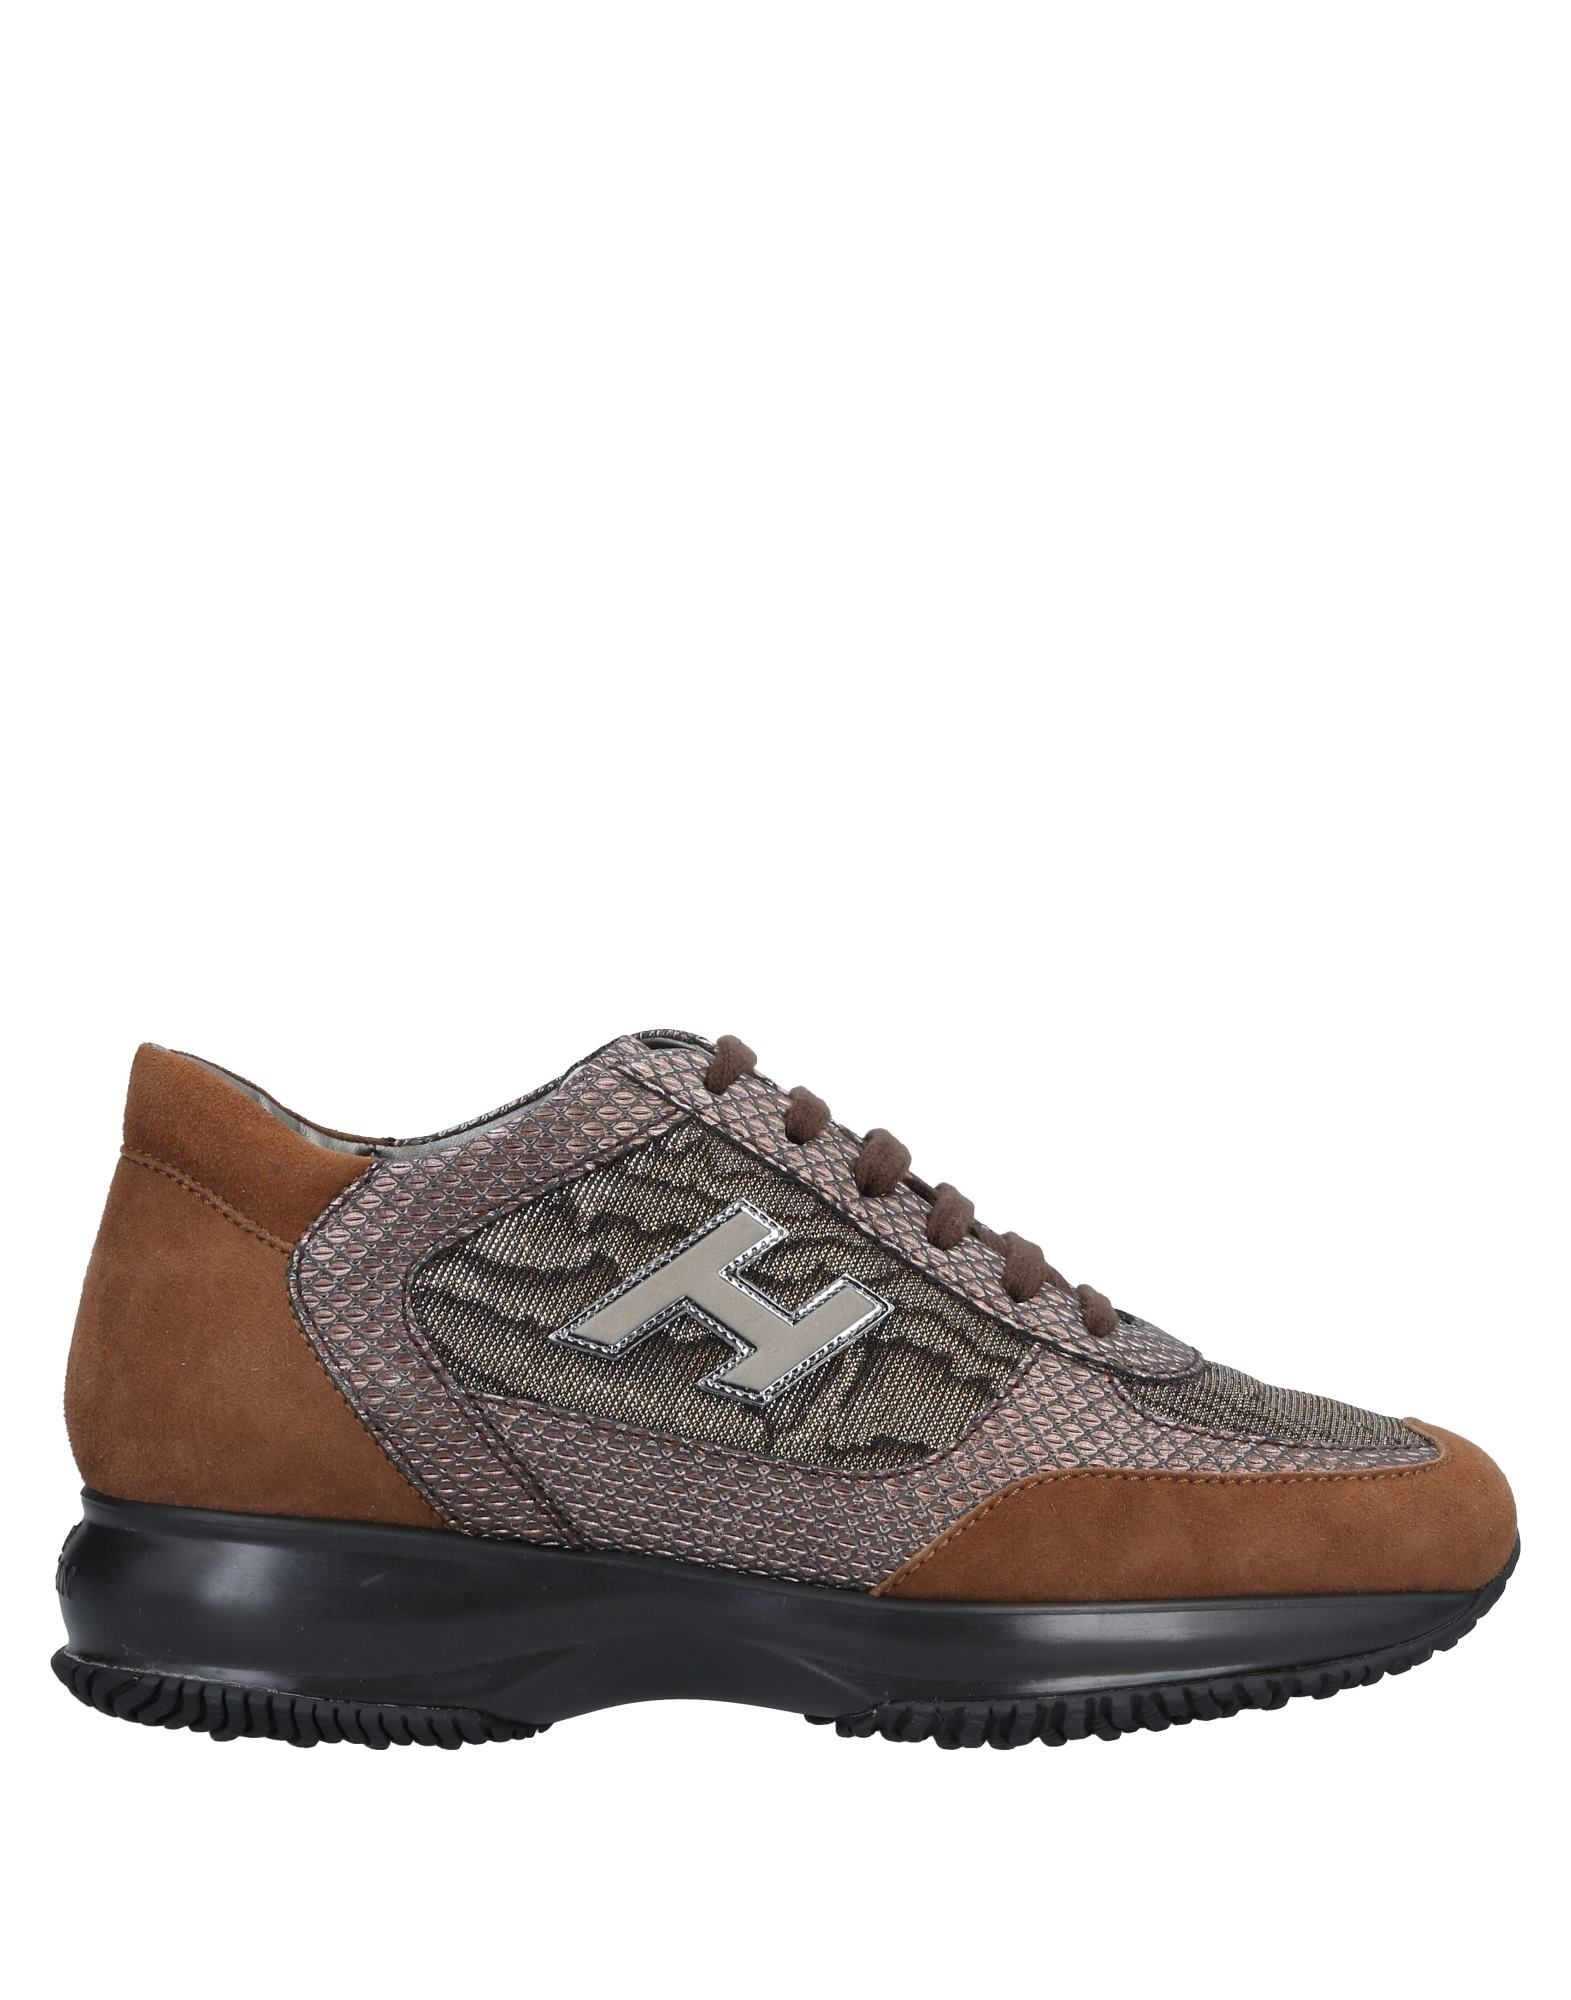 Sneakers Hogan Donna - 11567524FI elegante